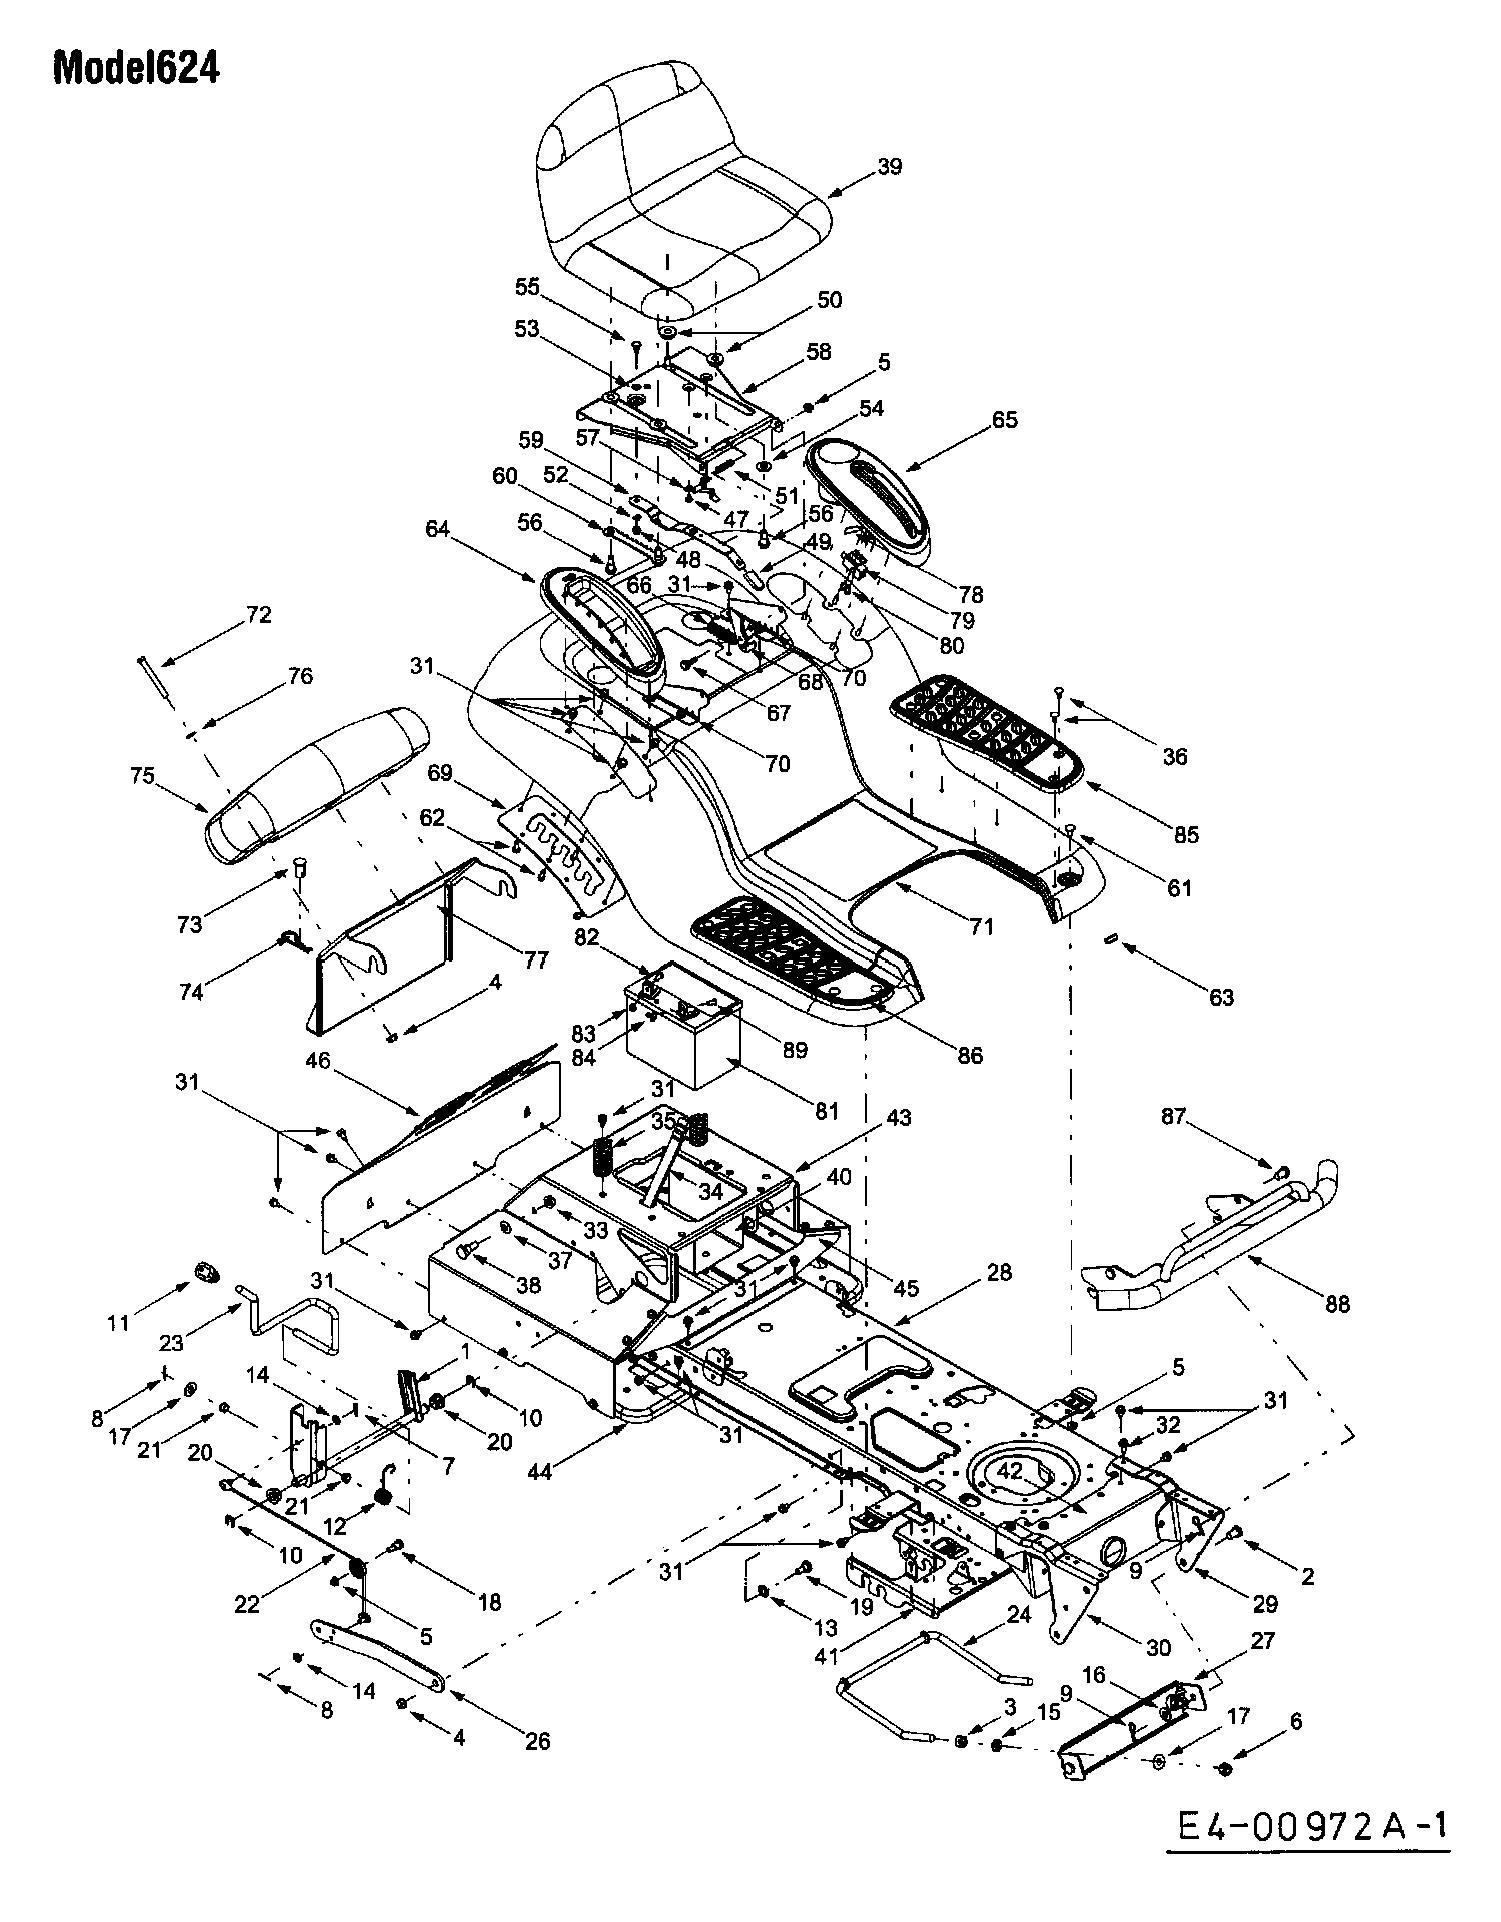 nissan 280zx wiring diagram imageresizertool com datsun 280zx engine diagram 240sx wiring diagram [ 1501 x 1922 Pixel ]